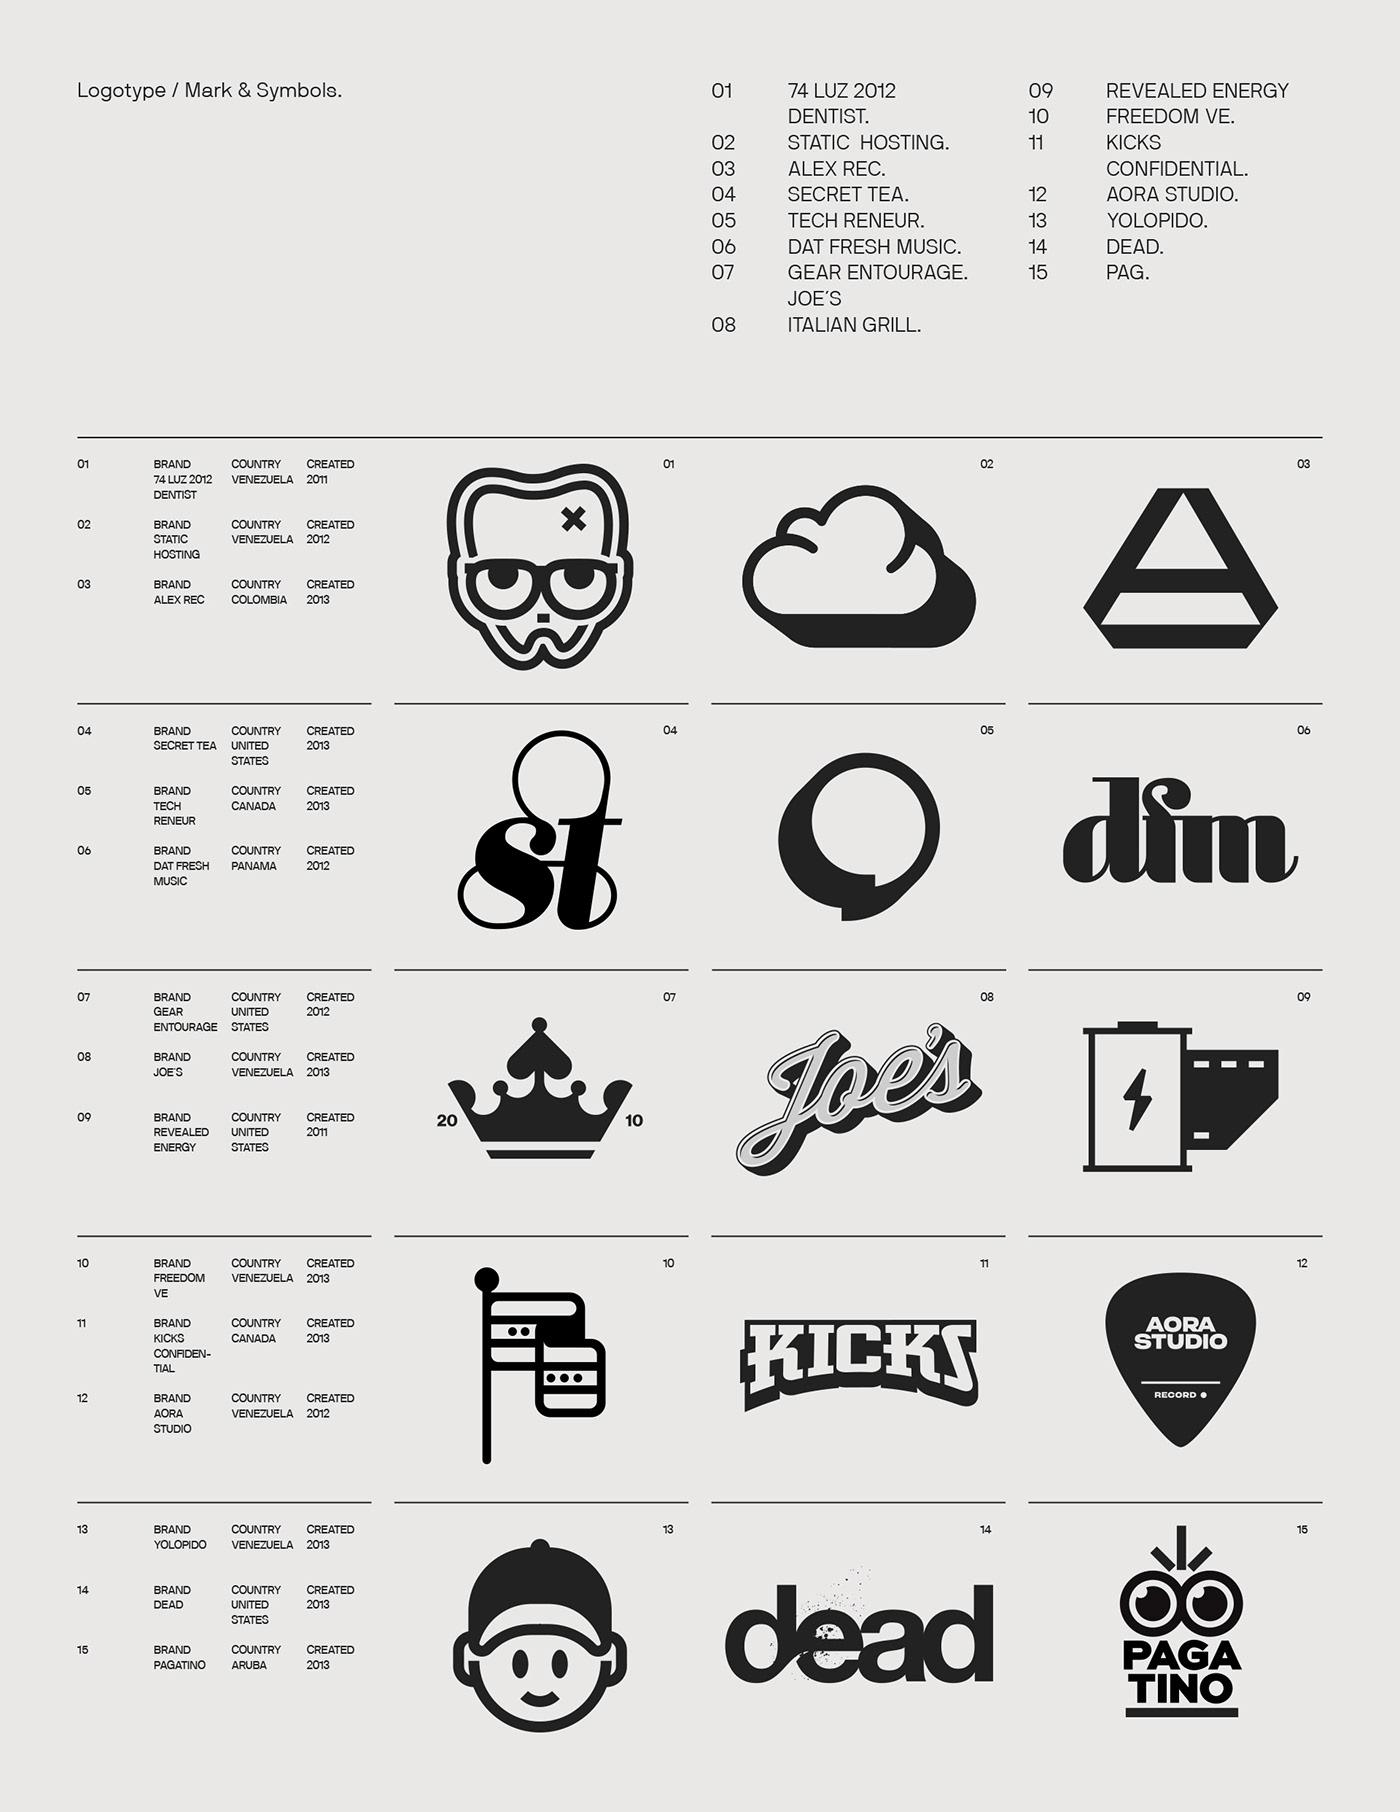 Logotype,logo,TYPOS,images,illustrations,winsvegas,logos,tipografia,maracaibo,venezuela,latinoamerica